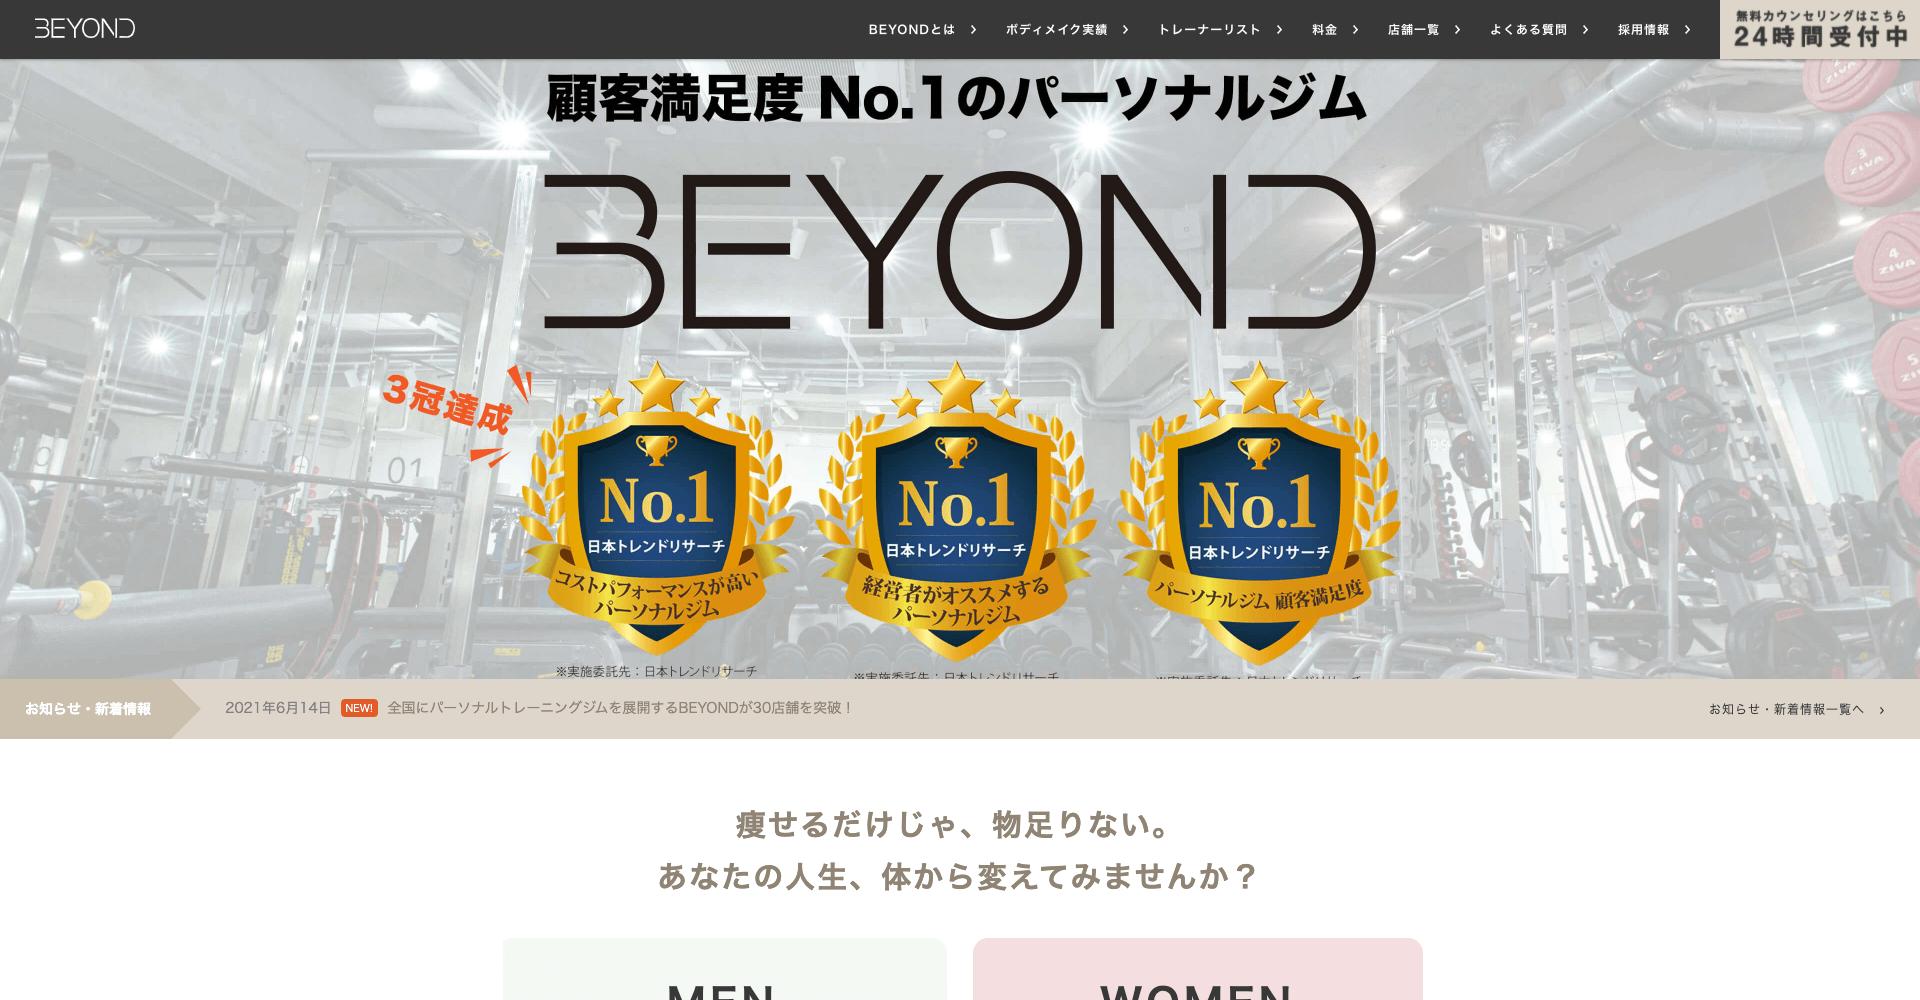 BEYOND(ビヨンド)ジム 所沢秋津店